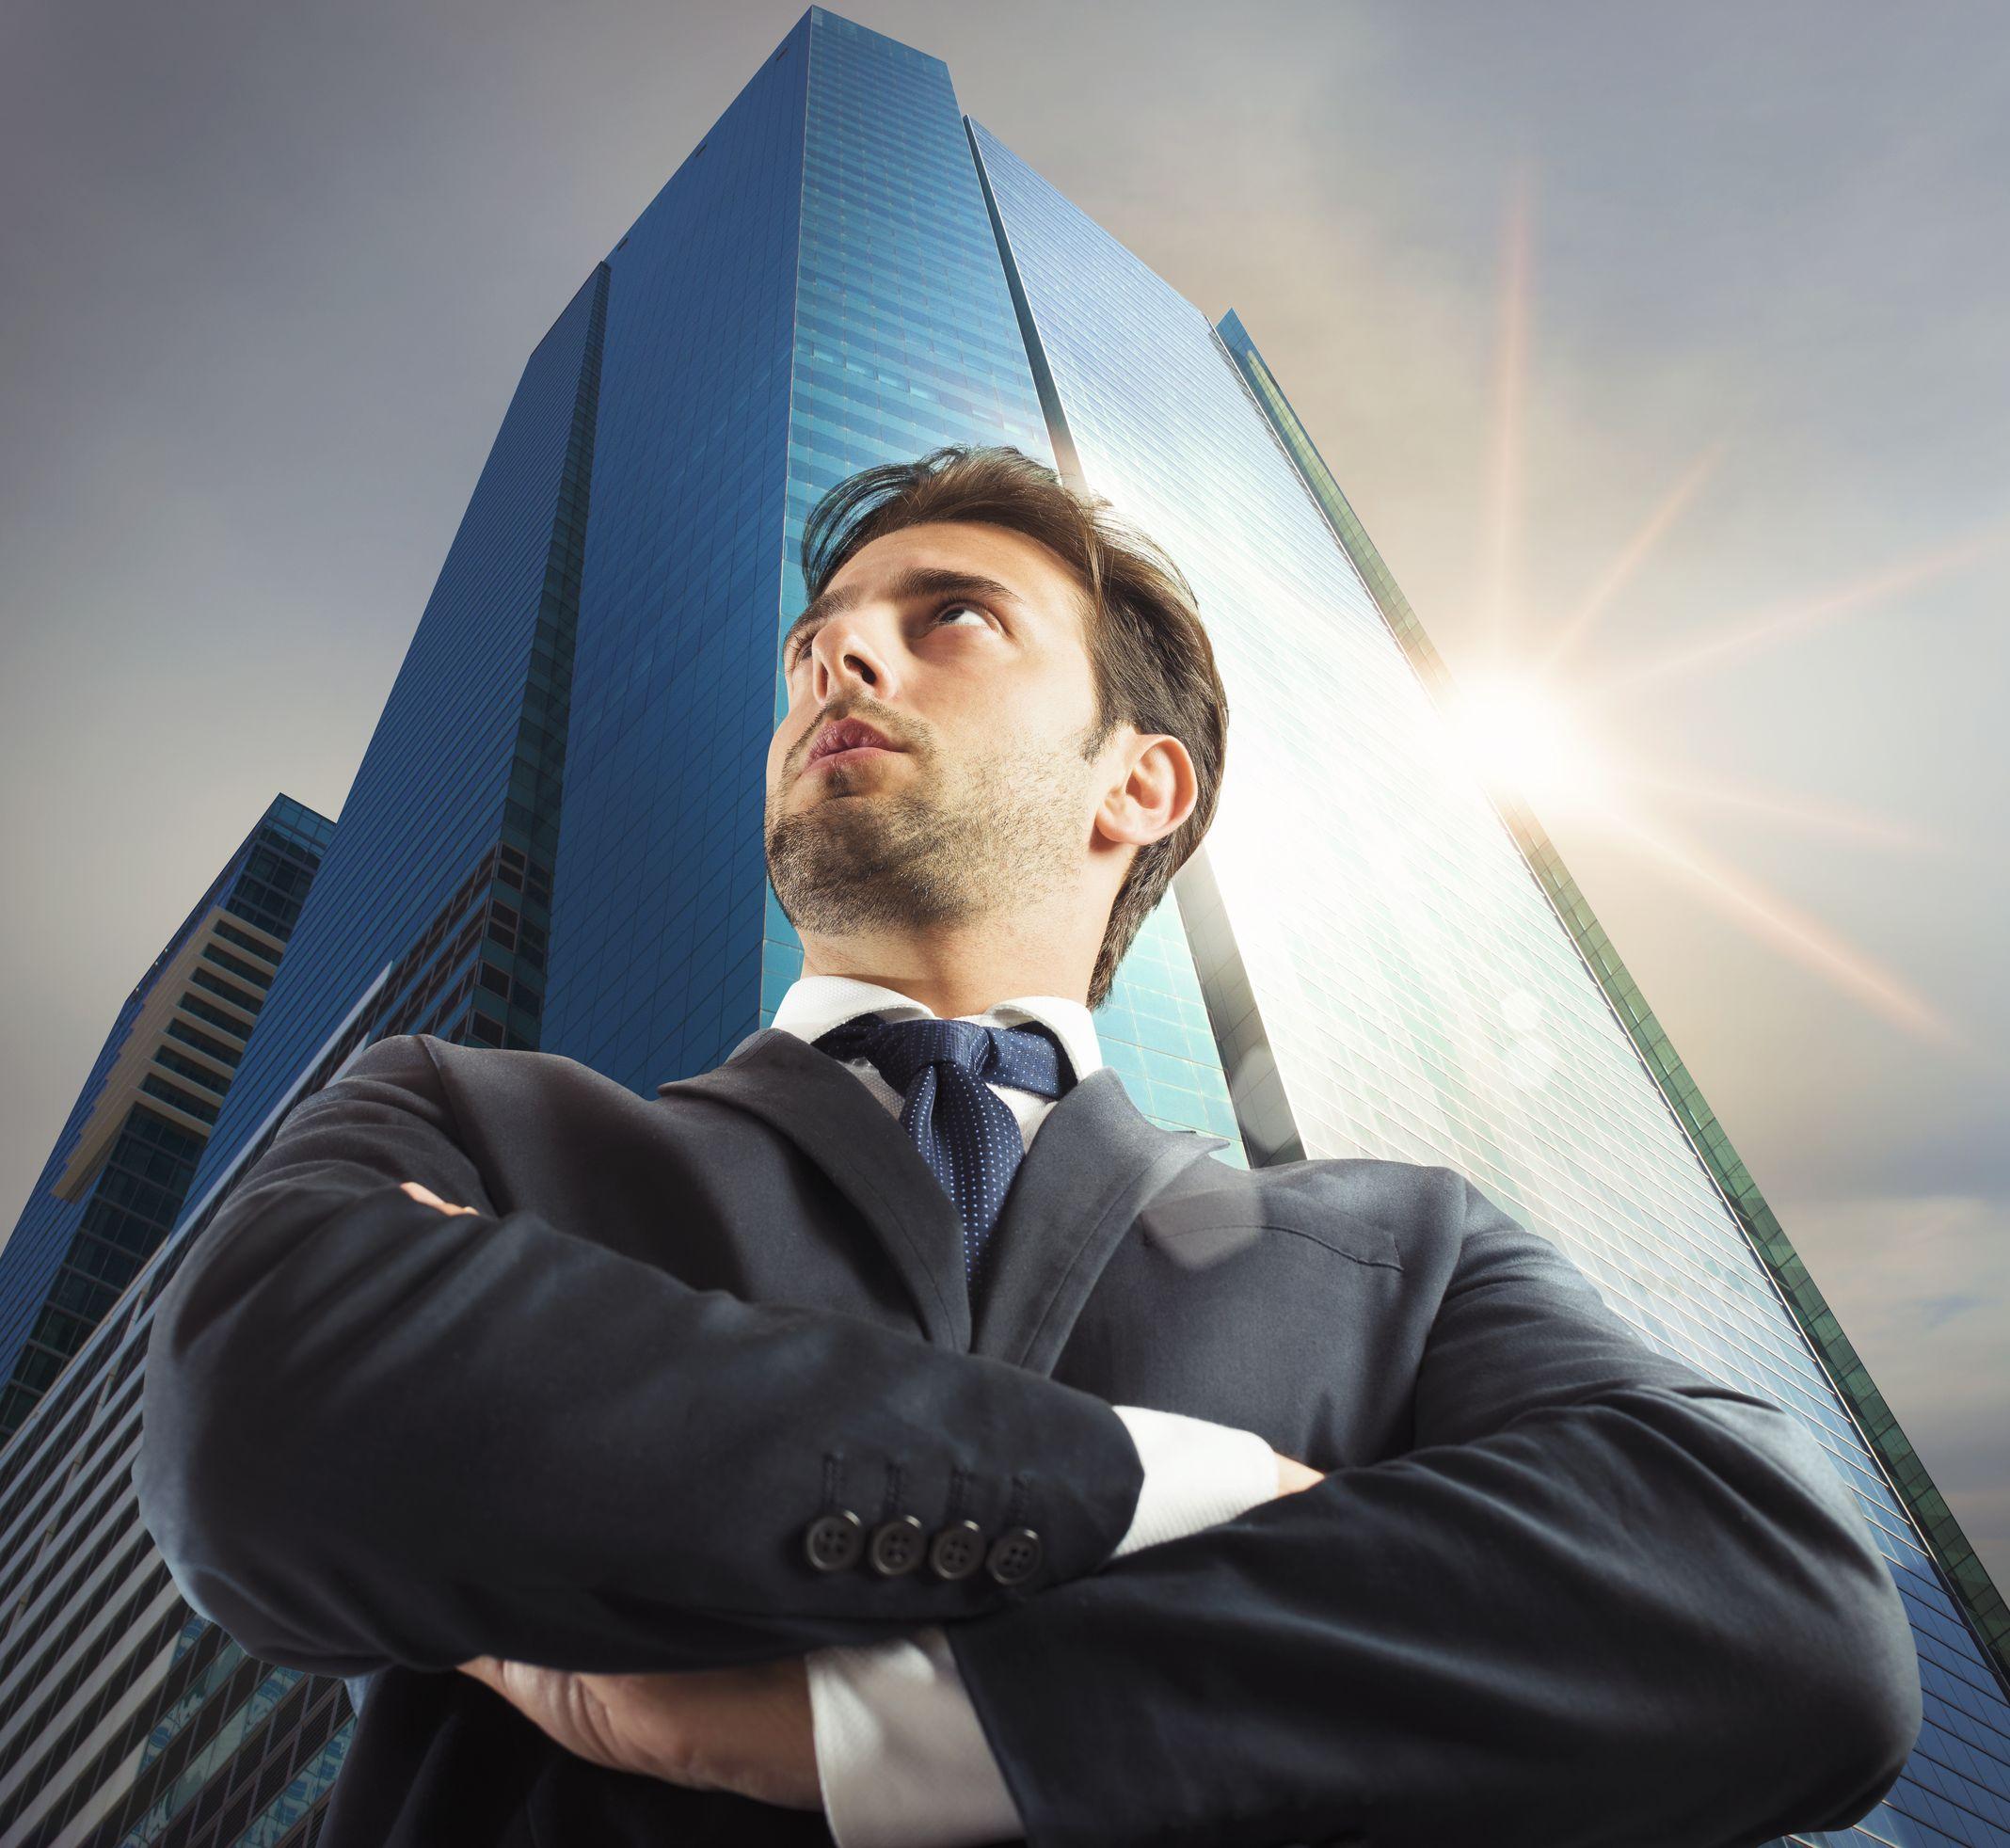 Successful_businessman_with_skyscraper_in_the_background.jpg